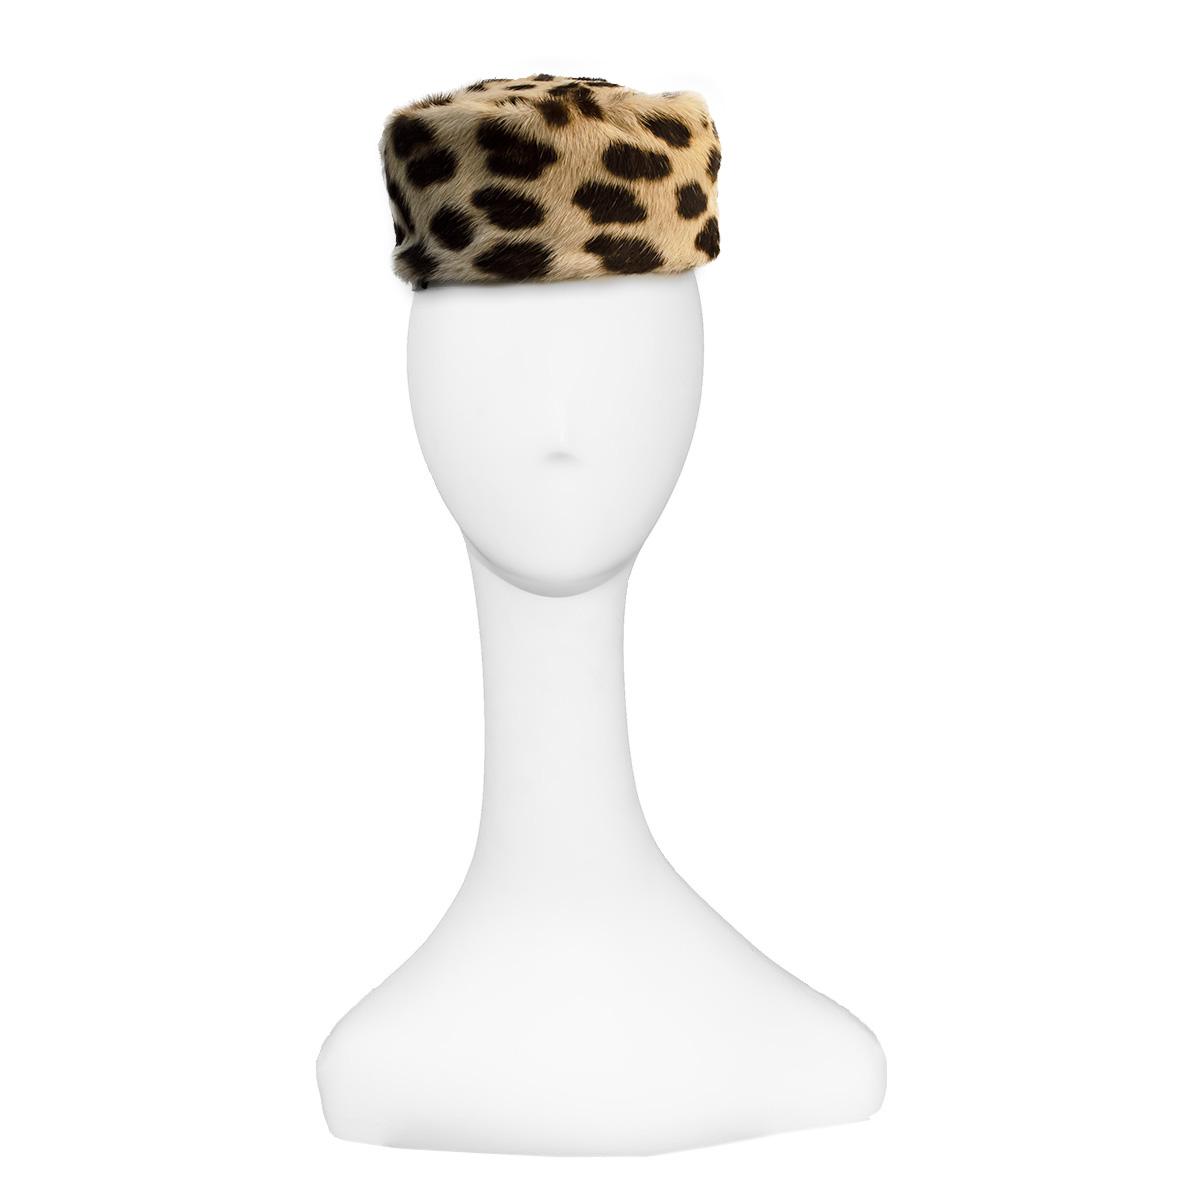 Bonta Creatrice Vintage hat